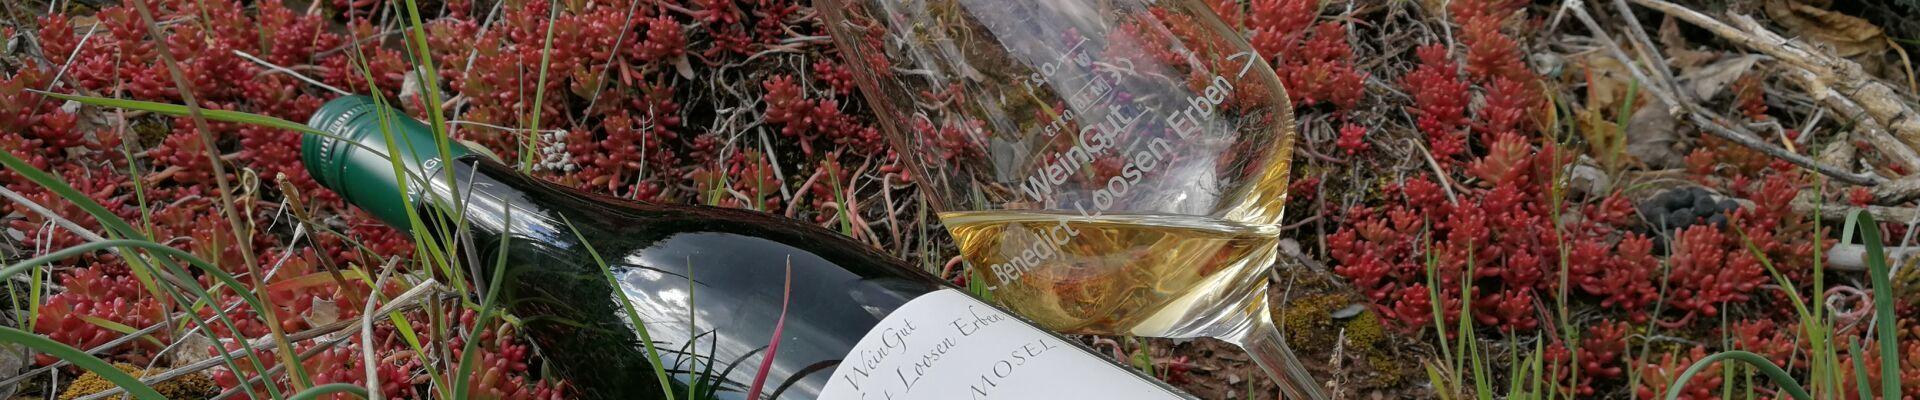 Riesling vom WeinGut Benedict Loosen Erben geht immer